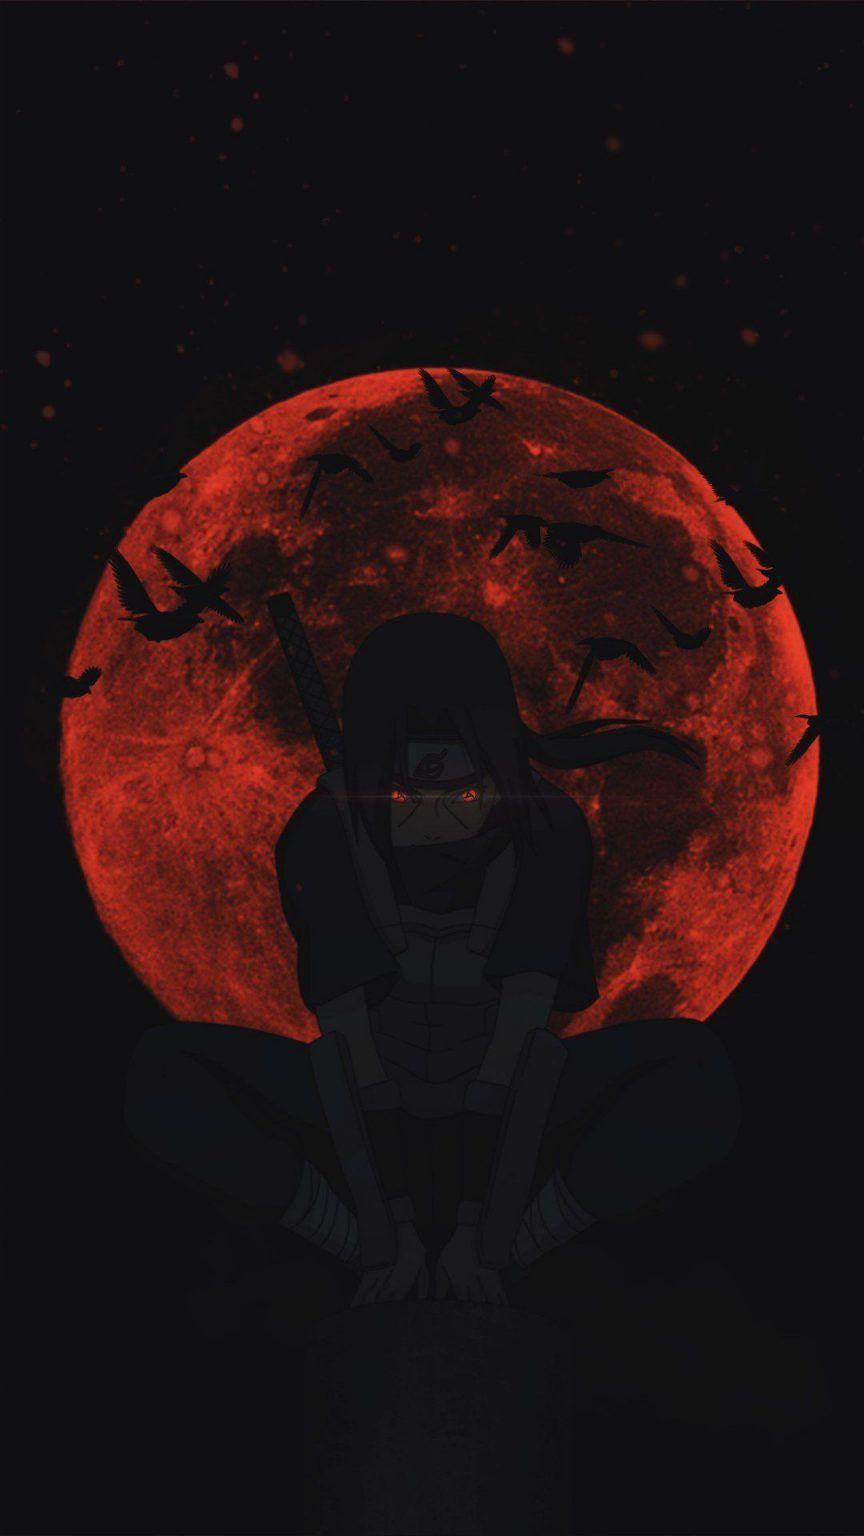 Fond D Ecran Naruto Hd Et 4k A Telecharger Gratuit En 2020 Fond D Ecran Dessin Art Naruto Fond D Ecran Telephone